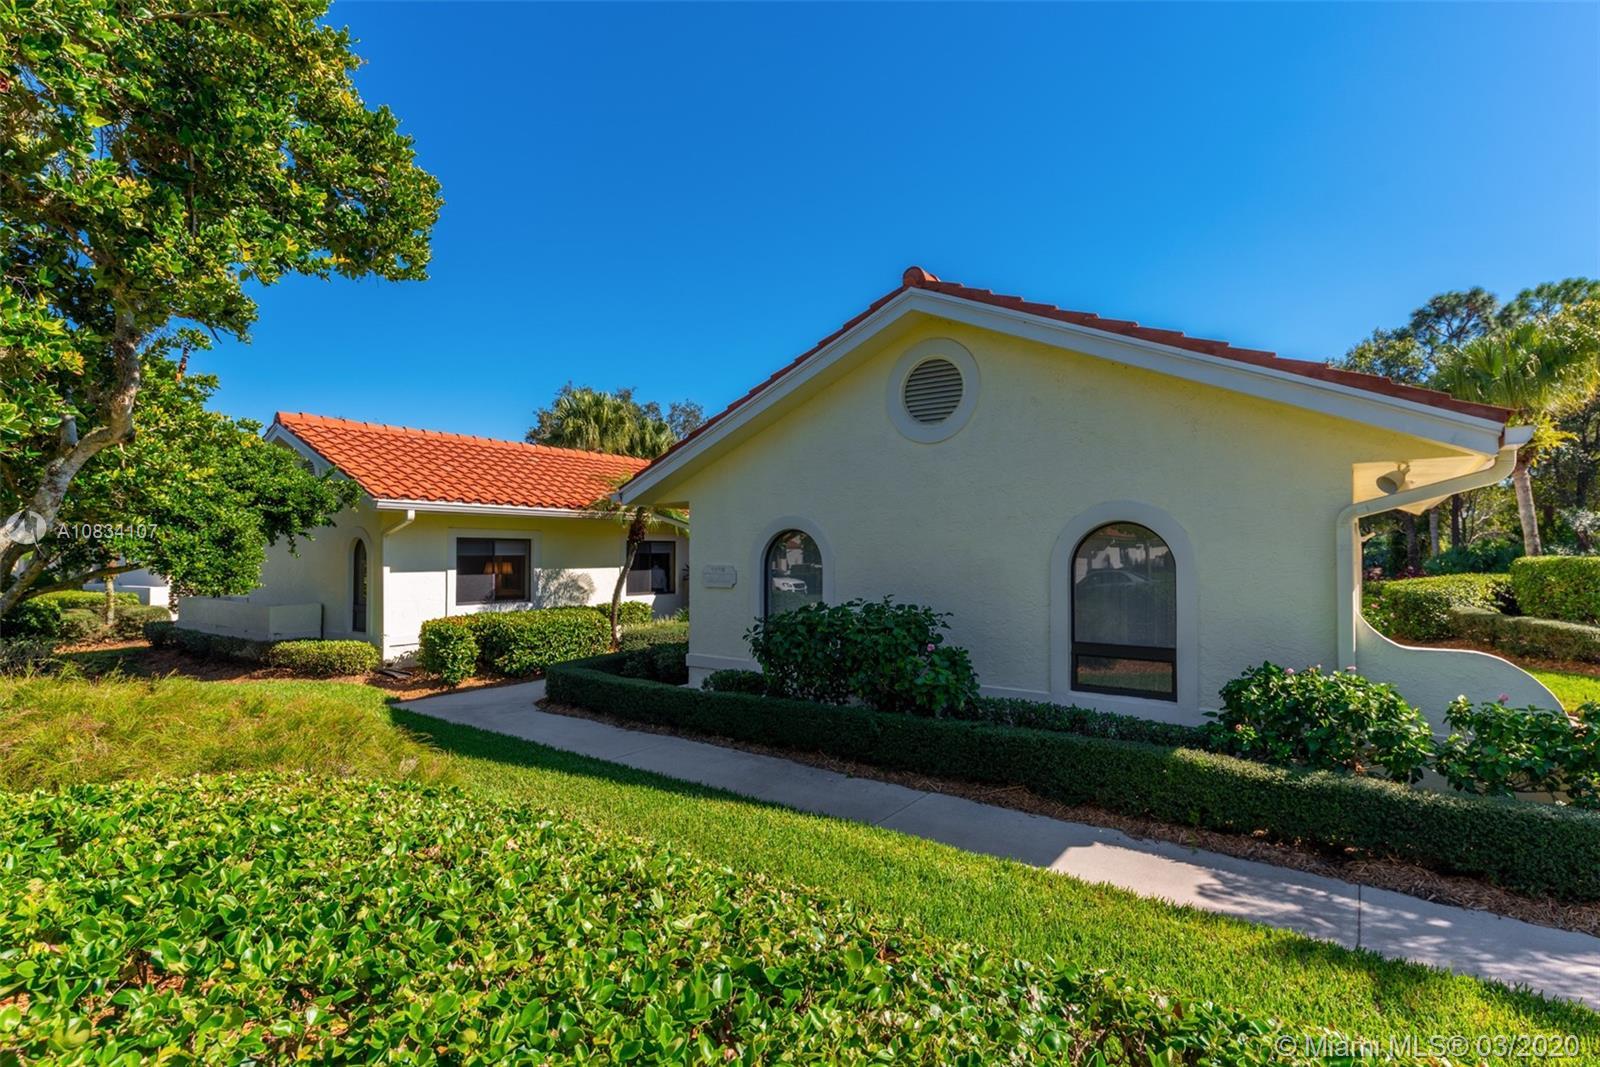 1805 NW Buttonbush Cir, Palm City, FL 34990